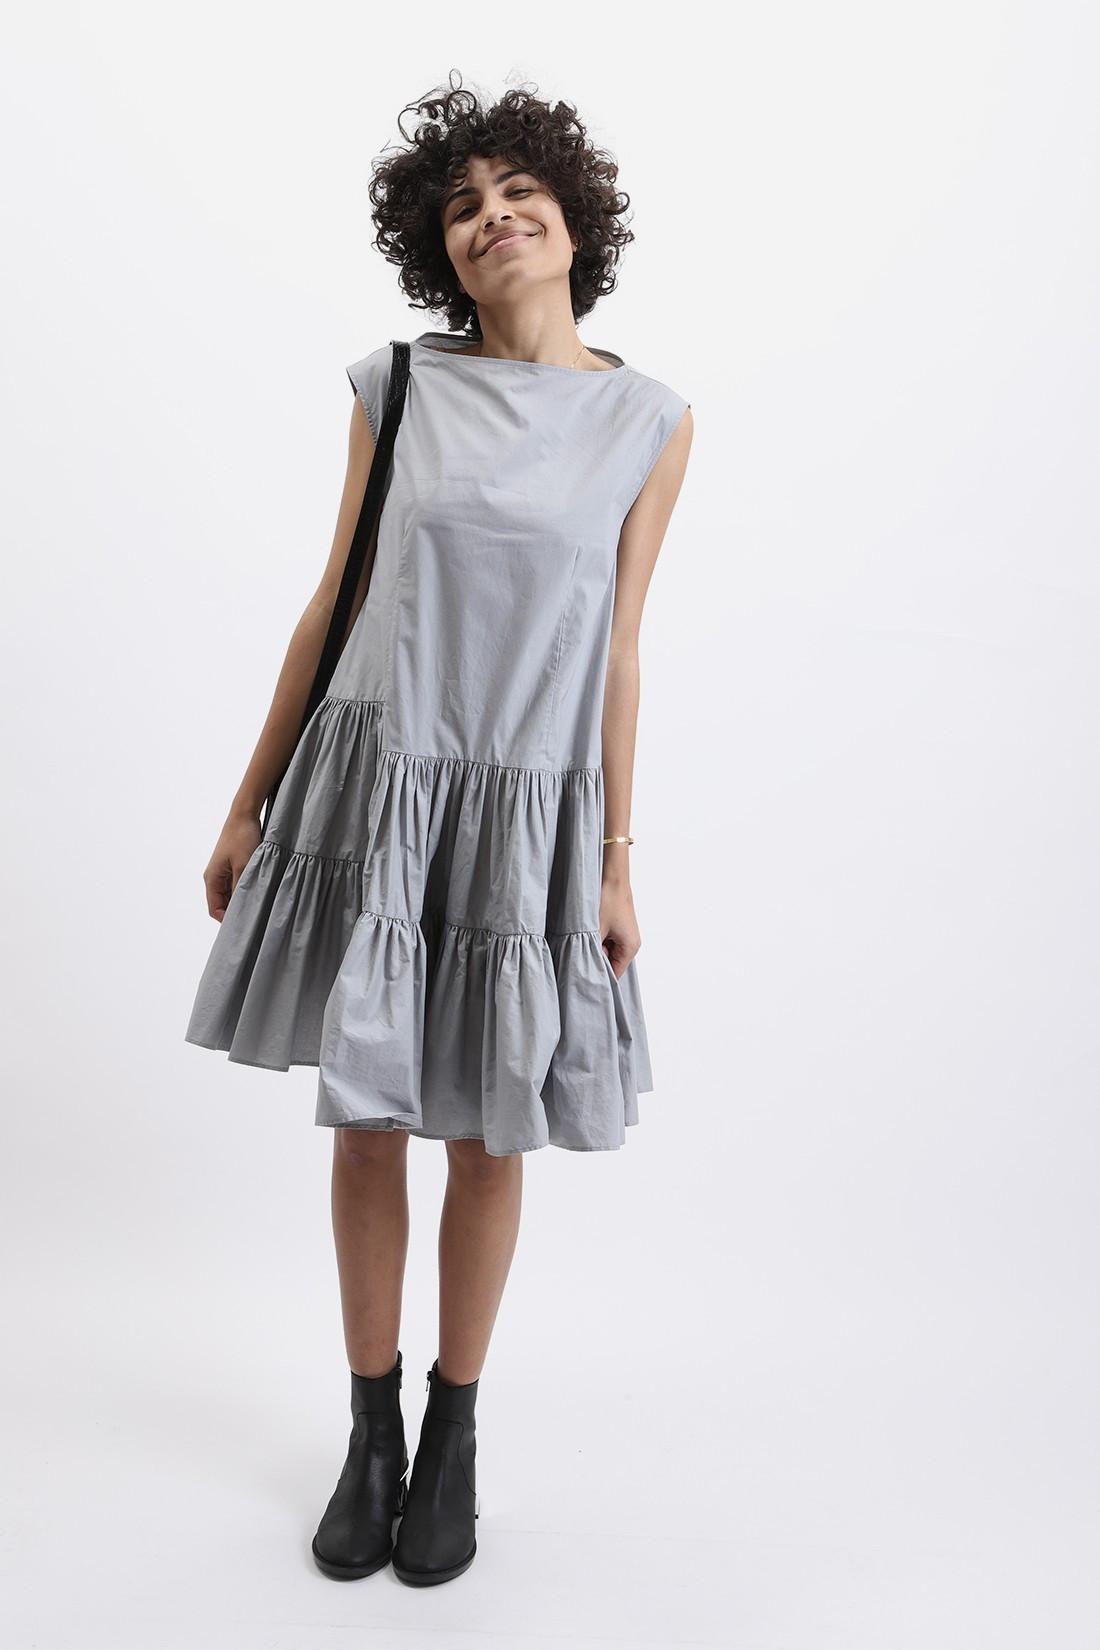 MM6 MAISON MARGIELA / Dress Grey